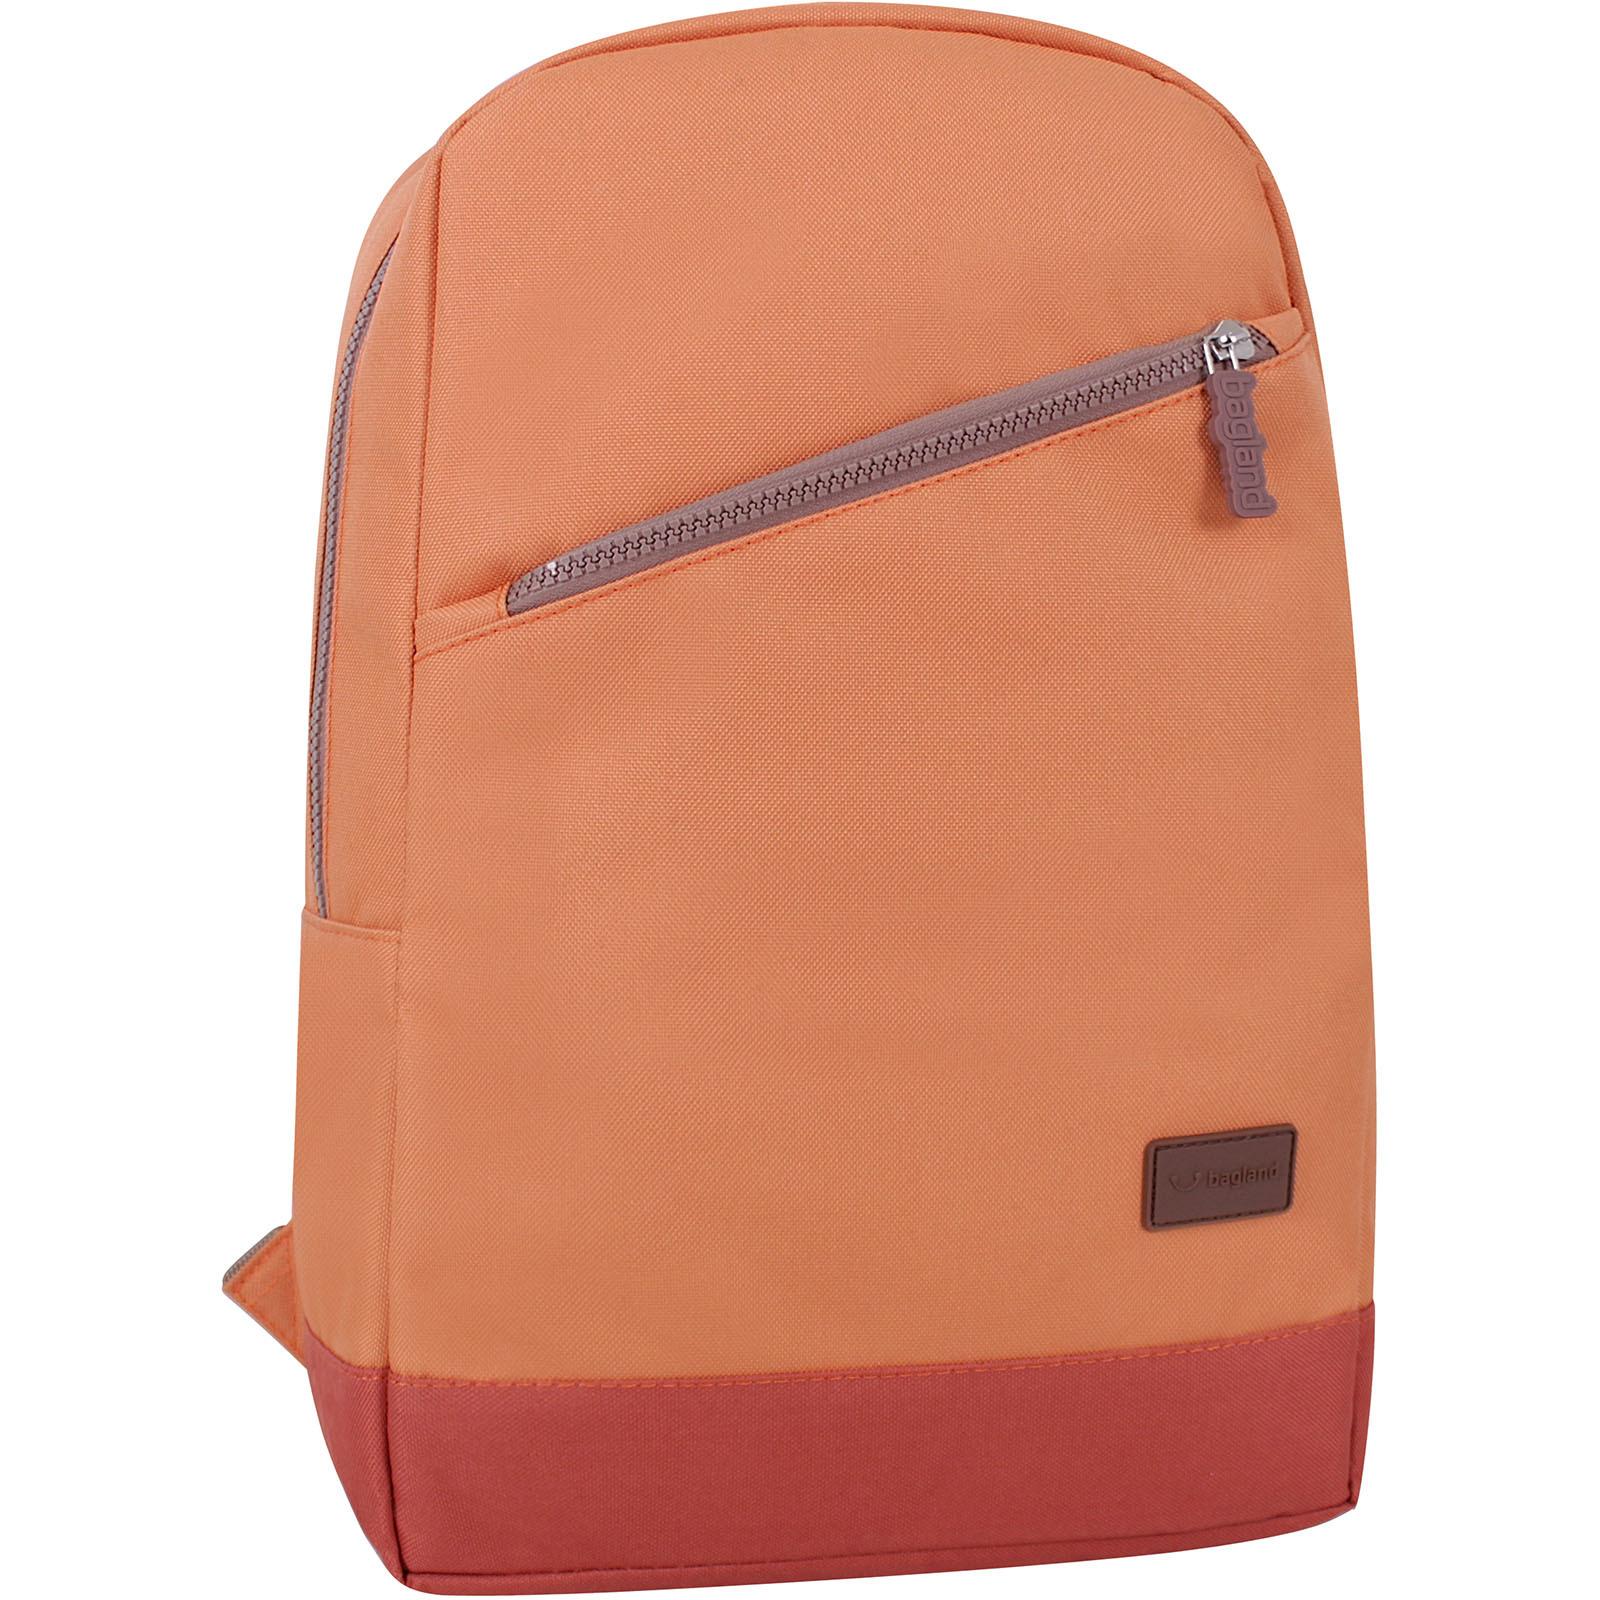 Городские рюкзаки Рюкзак Bagland Amber 15 л. рыжий/кирпич (0010466) IMG_9757_рыжий._кирпич_.JPG